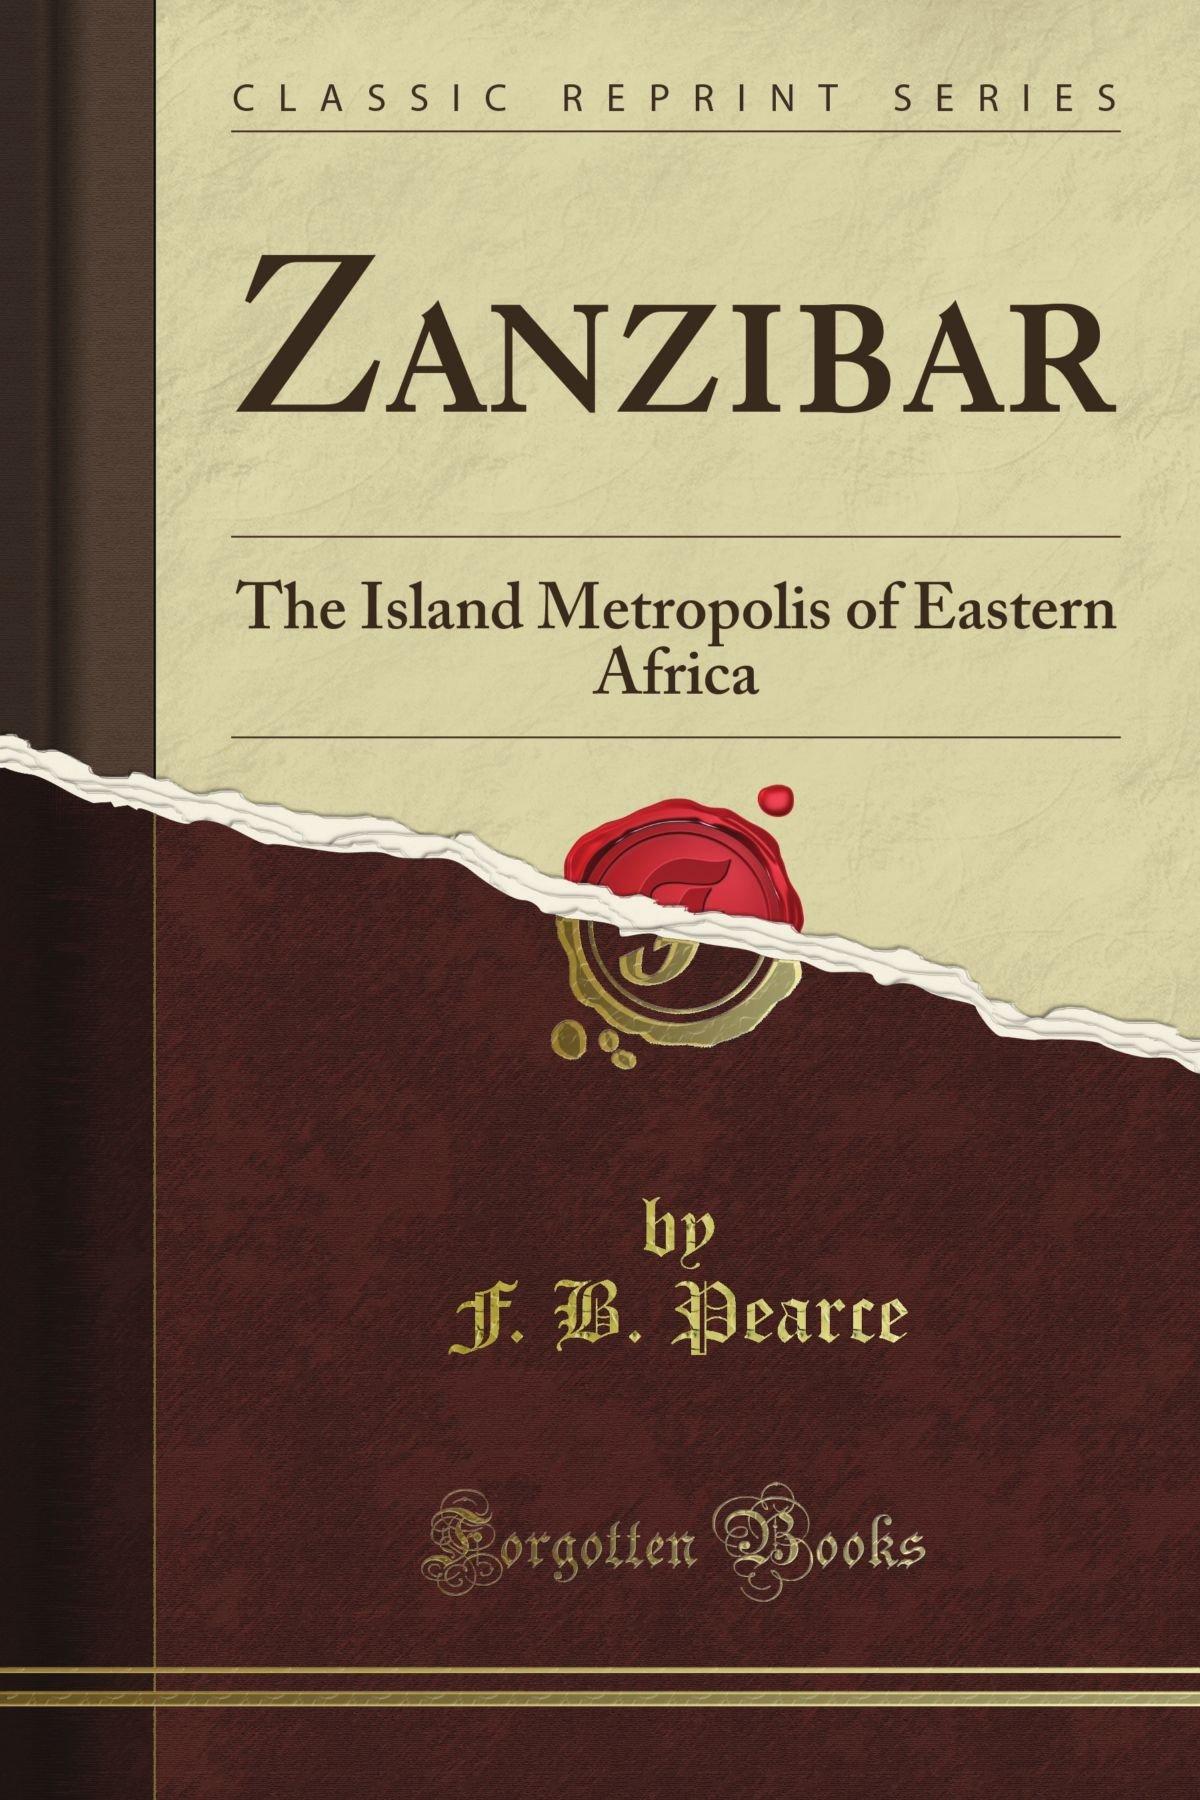 zanzibar-the-island-metropolis-of-eastern-africa-classic-reprint